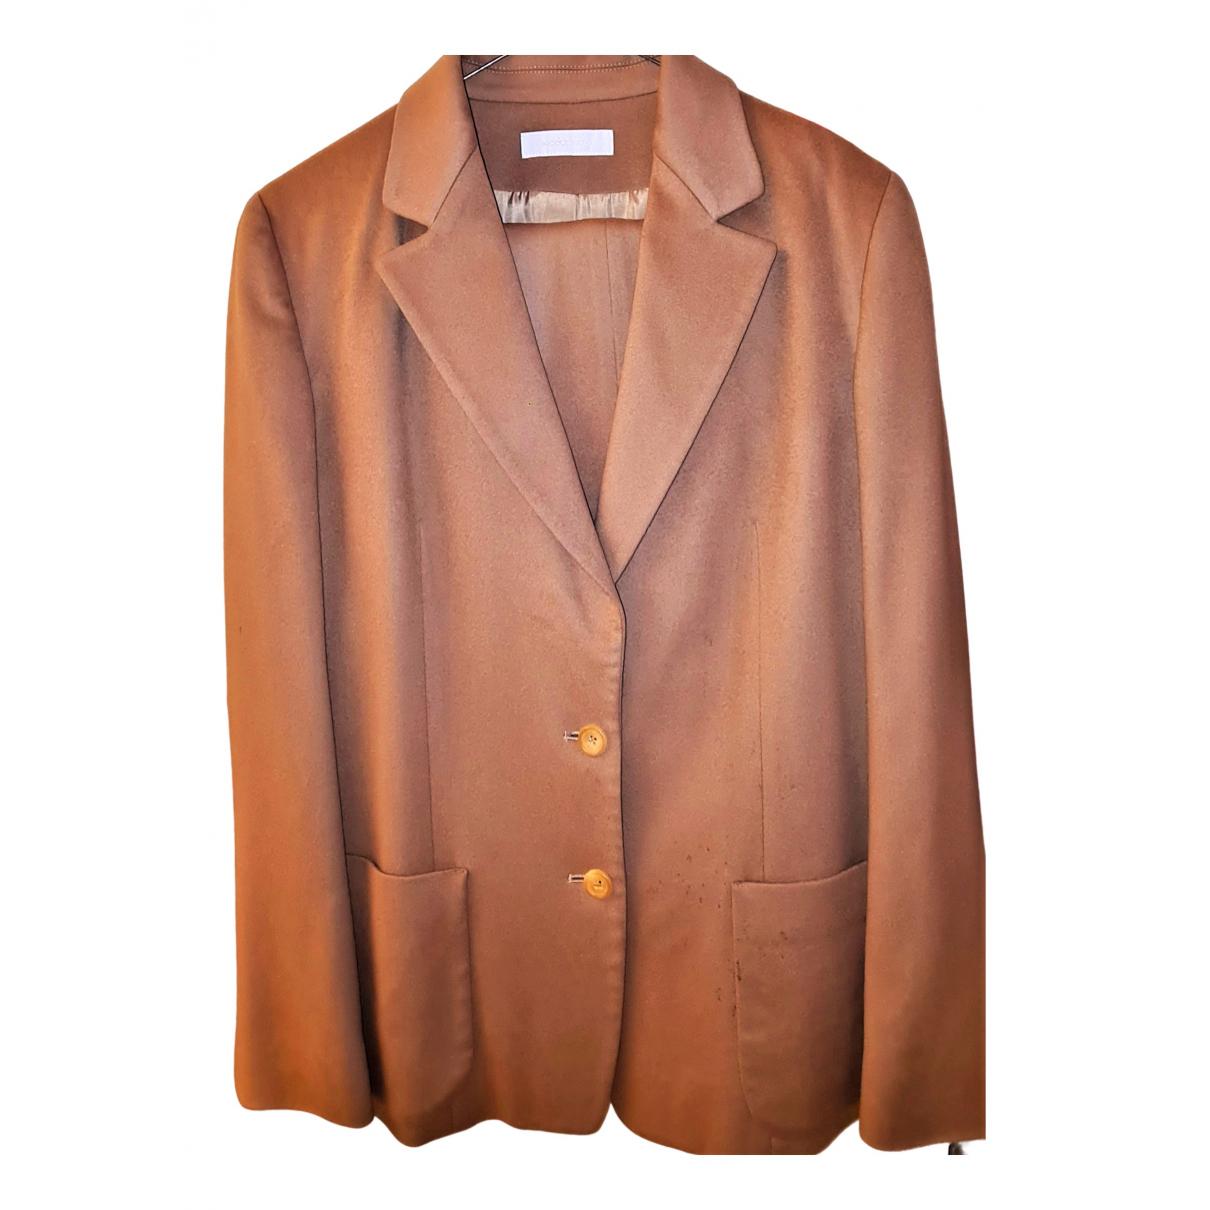 Nicole Farhi N Camel Cashmere jacket for Women 10 UK